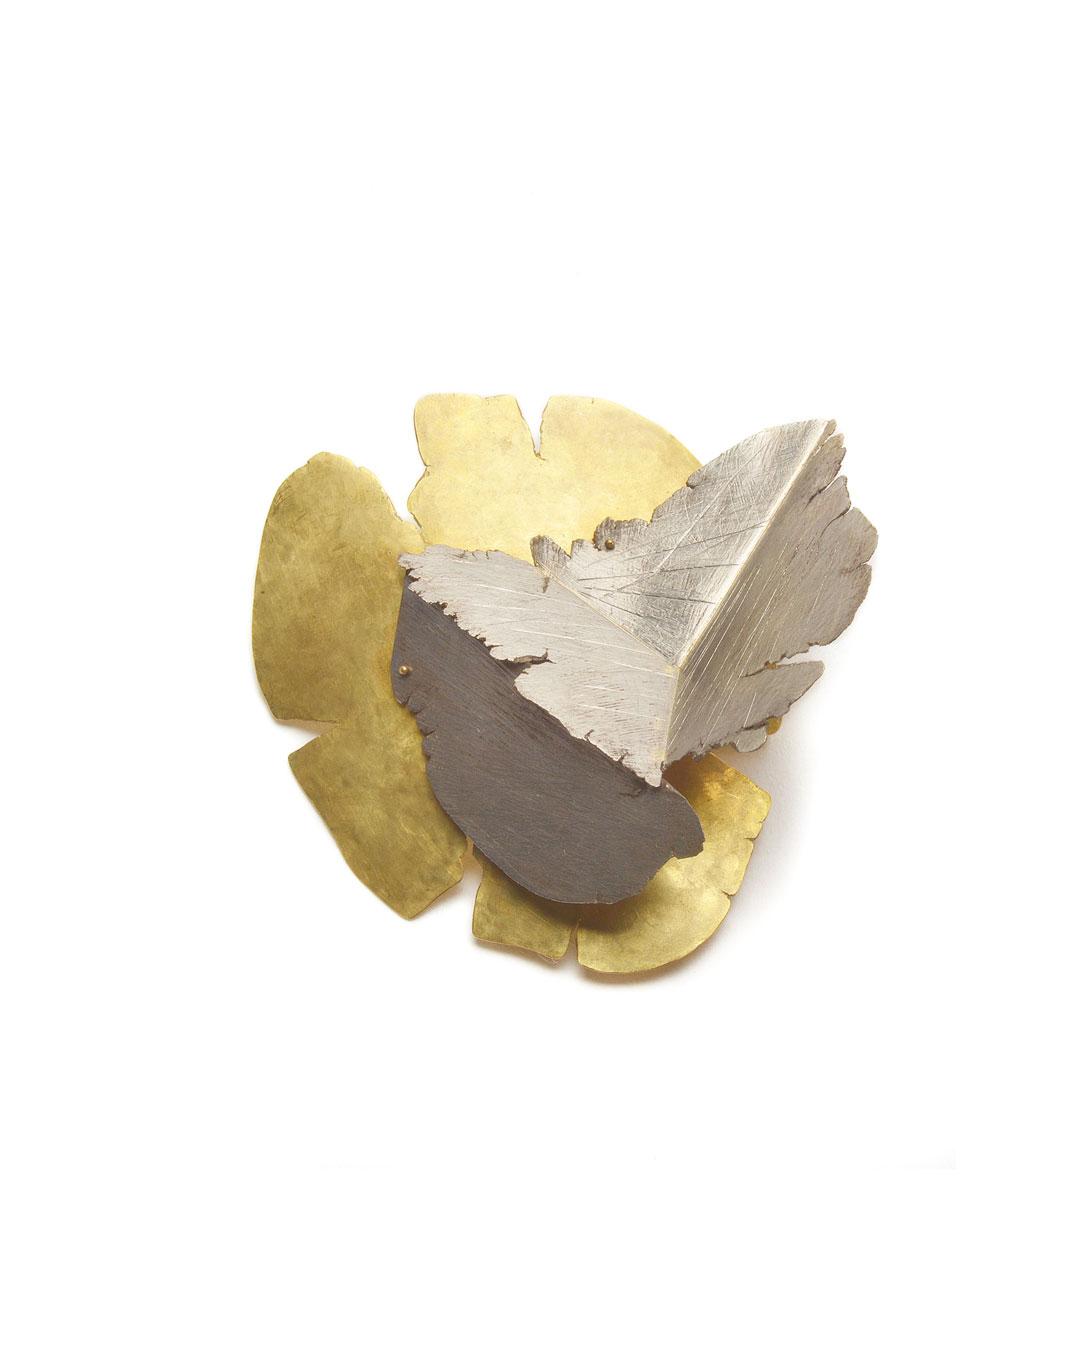 Stefano Marchetti, untitled, 2008, brooch; gold, 65 x 68 x 30 mm, €6100